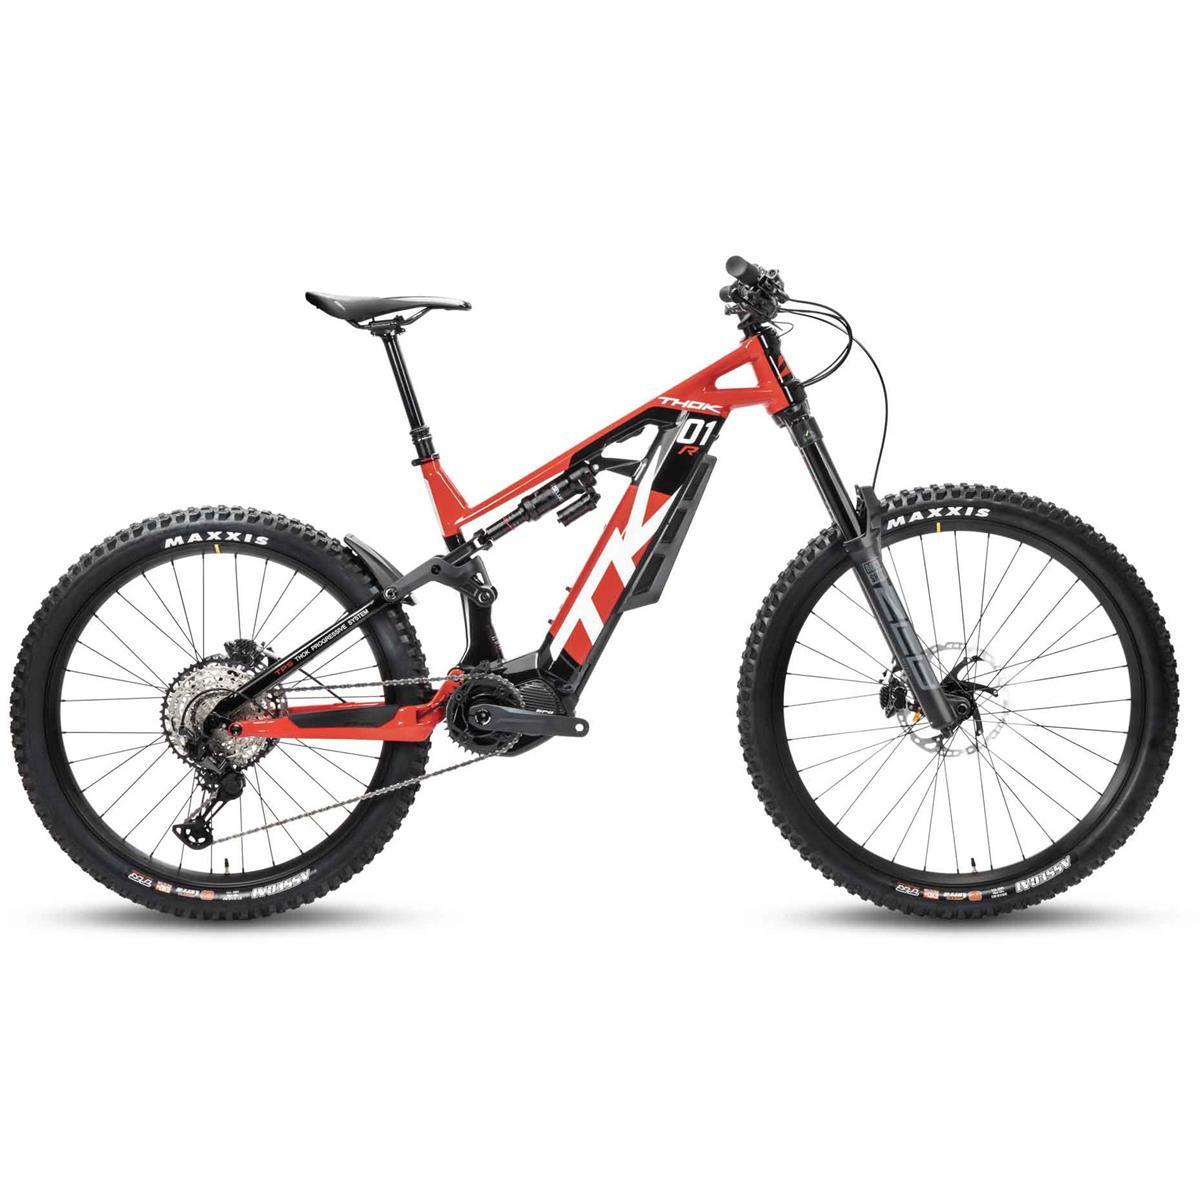 TK01 R 29''/27.5'' 170mm 12v 630Wh Shimano EP8 Black/Red 2021 Size S